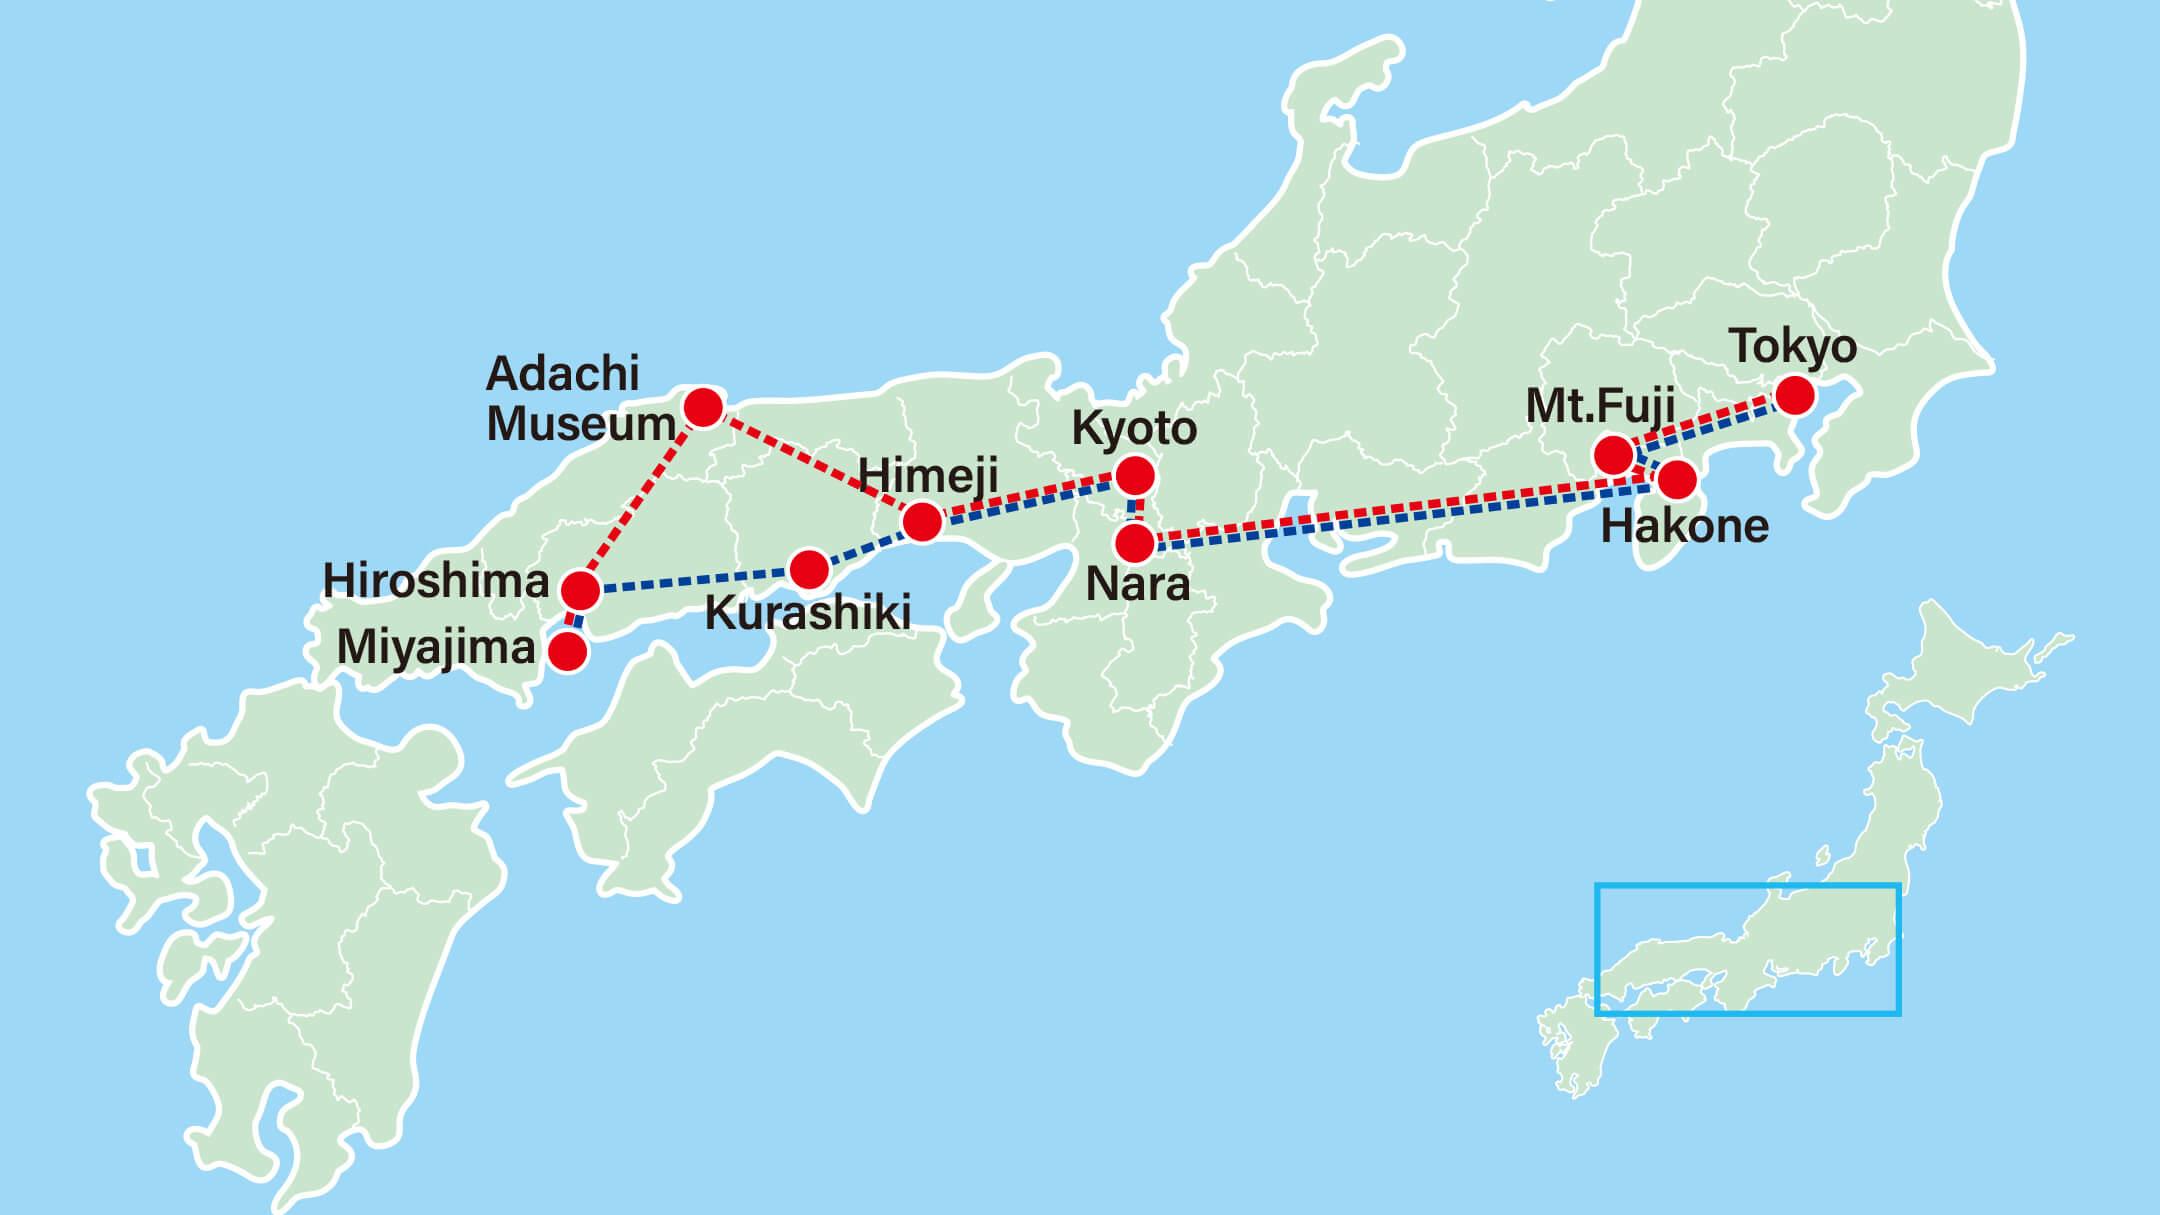 9 Day Japan Highlights Journey-Hiroshima-Kyoto-Nara-Mt Fuji-Hakone-Tokyo